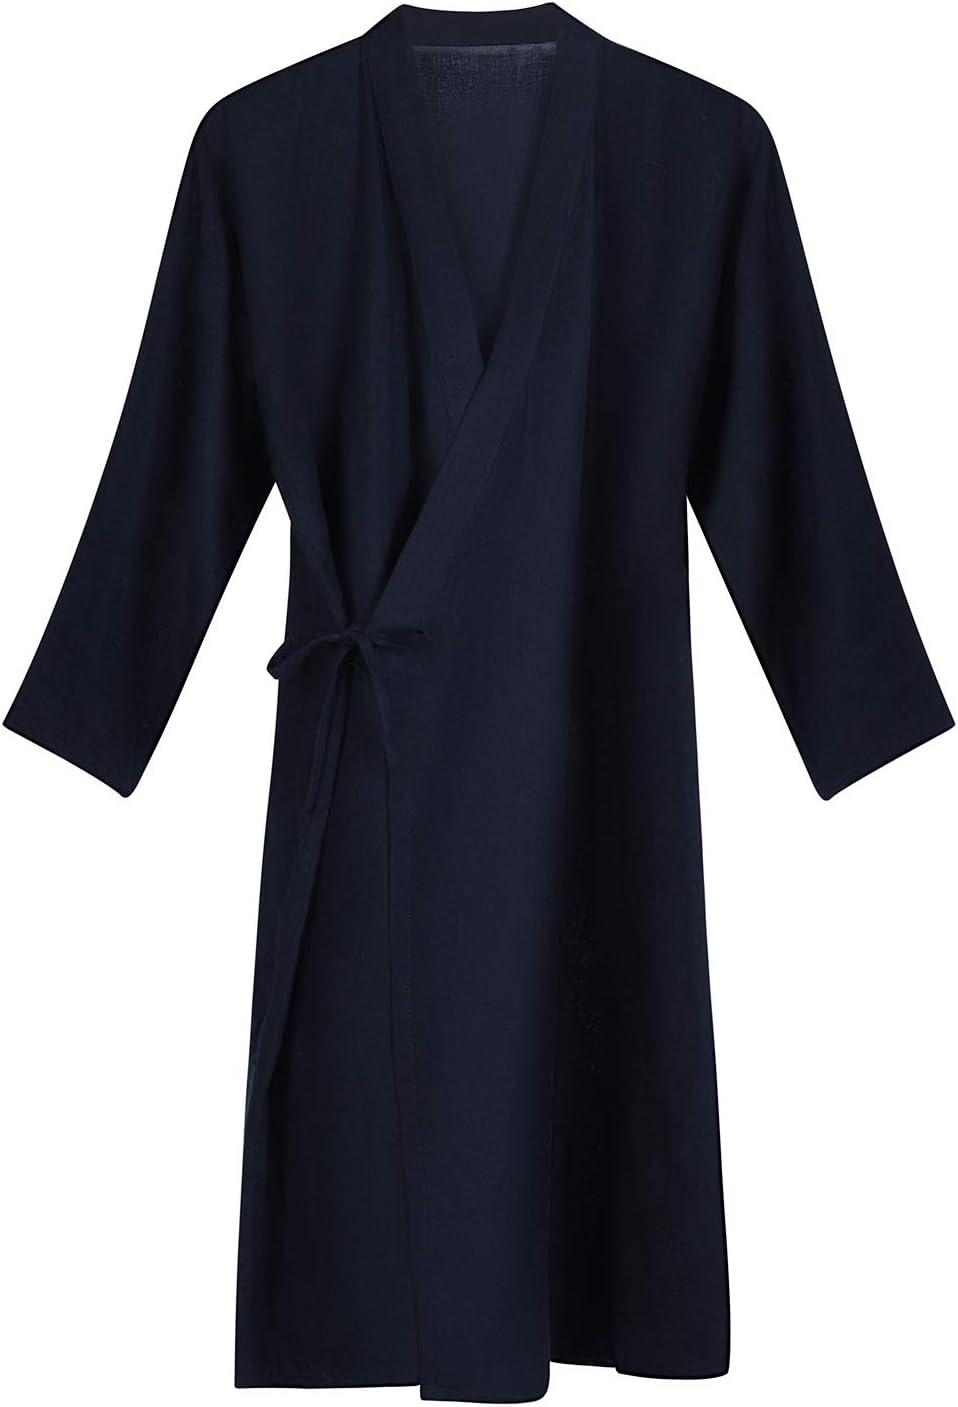 Cotton Yukata Kimono Robe Max 85% OFF Waffle Japanese Light Bathrobe Pajamas New product